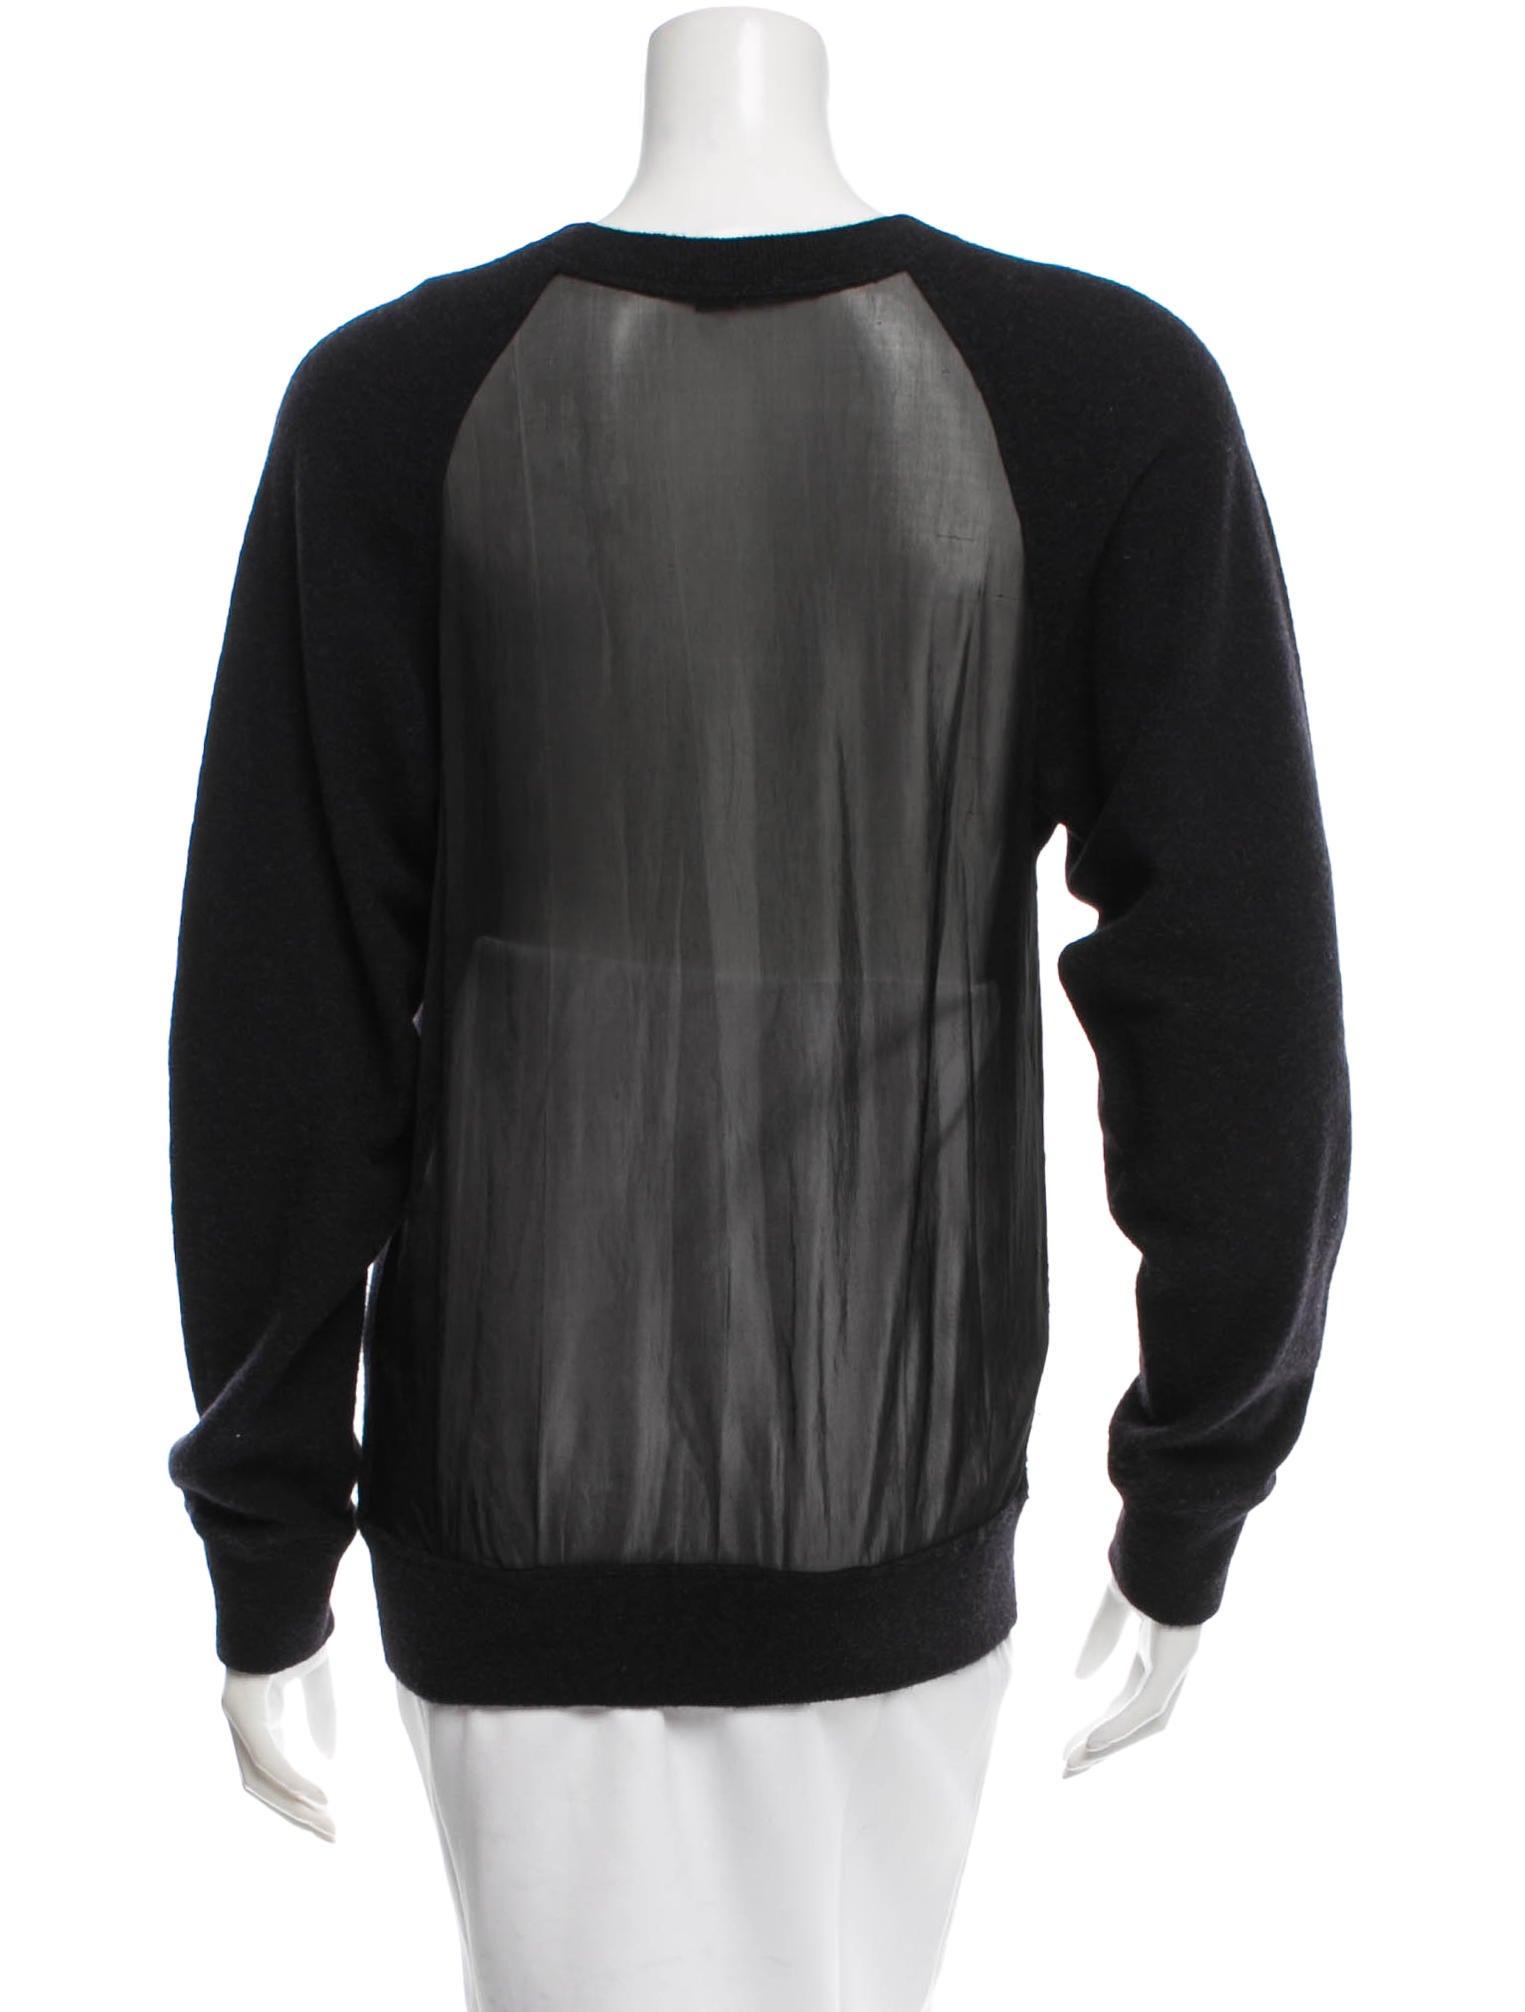 Women's Merino Wool V-Neck Pullover Sweater. from $ 93 45 Prime. out of 5 stars 4. Pendleton. Women's Timeless Merino Wool Turtleneck Sweater. from $ 60 57 Prime. out of 5 stars 4. Icebreaker Merino. Everyday Base Layer Long Sleeve Crew Neck Shirt, New Zealand Merino Wool. from $ 34 95 Prime.